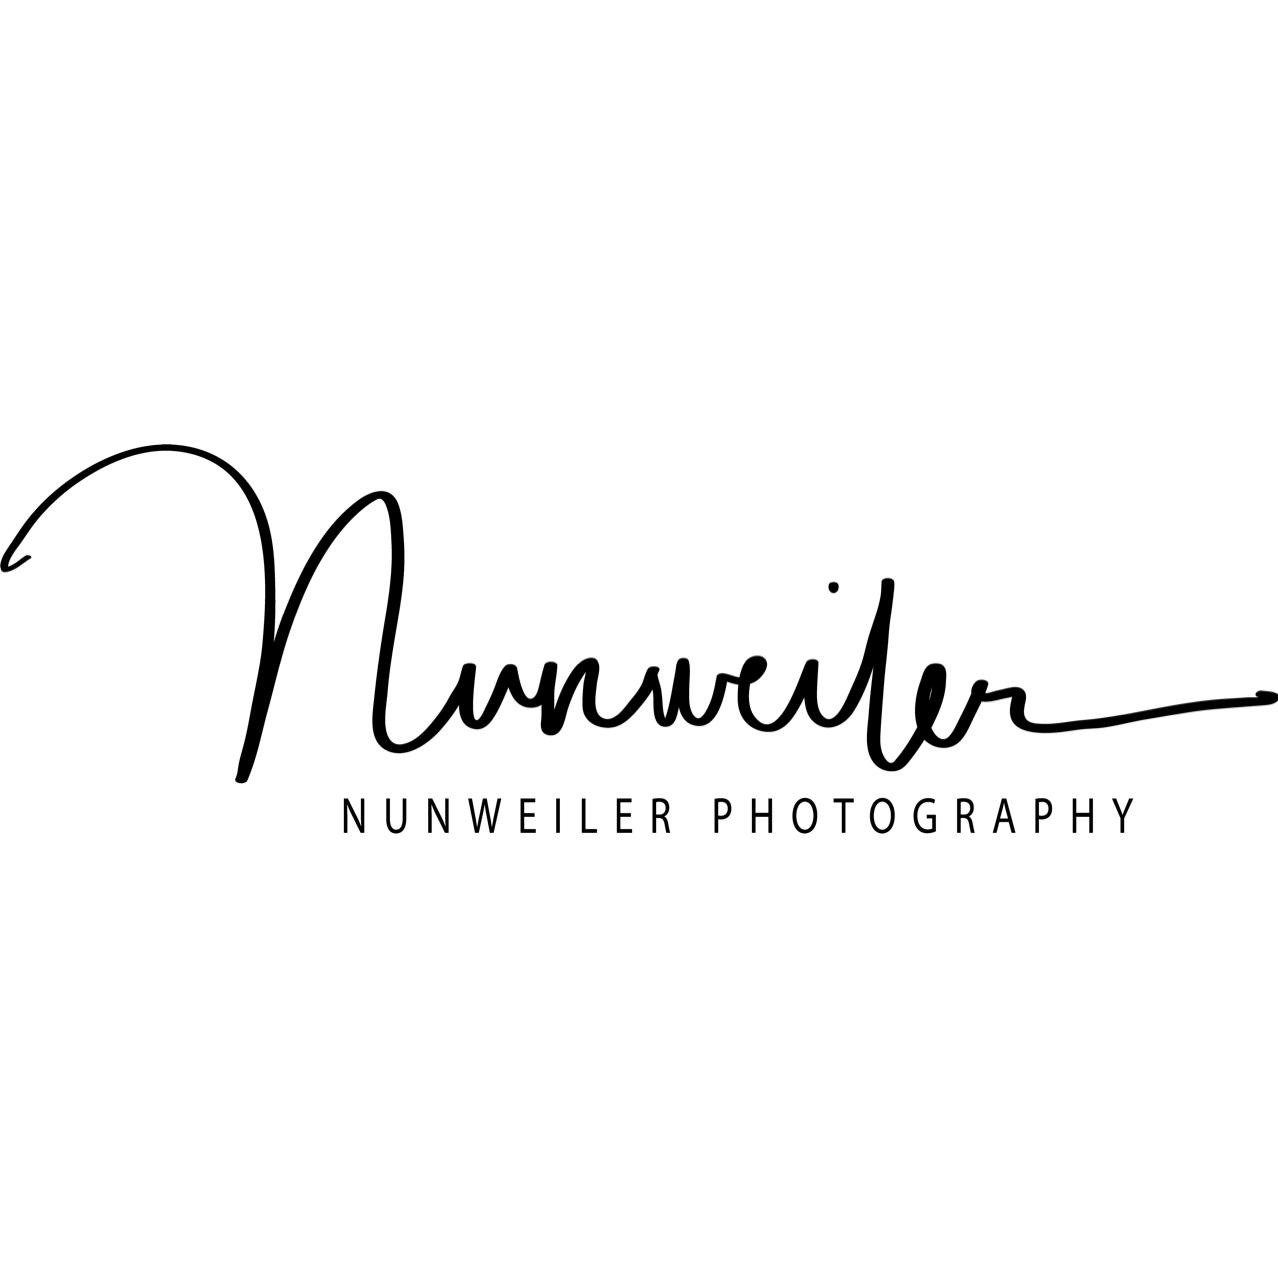 Nunweiler Photography